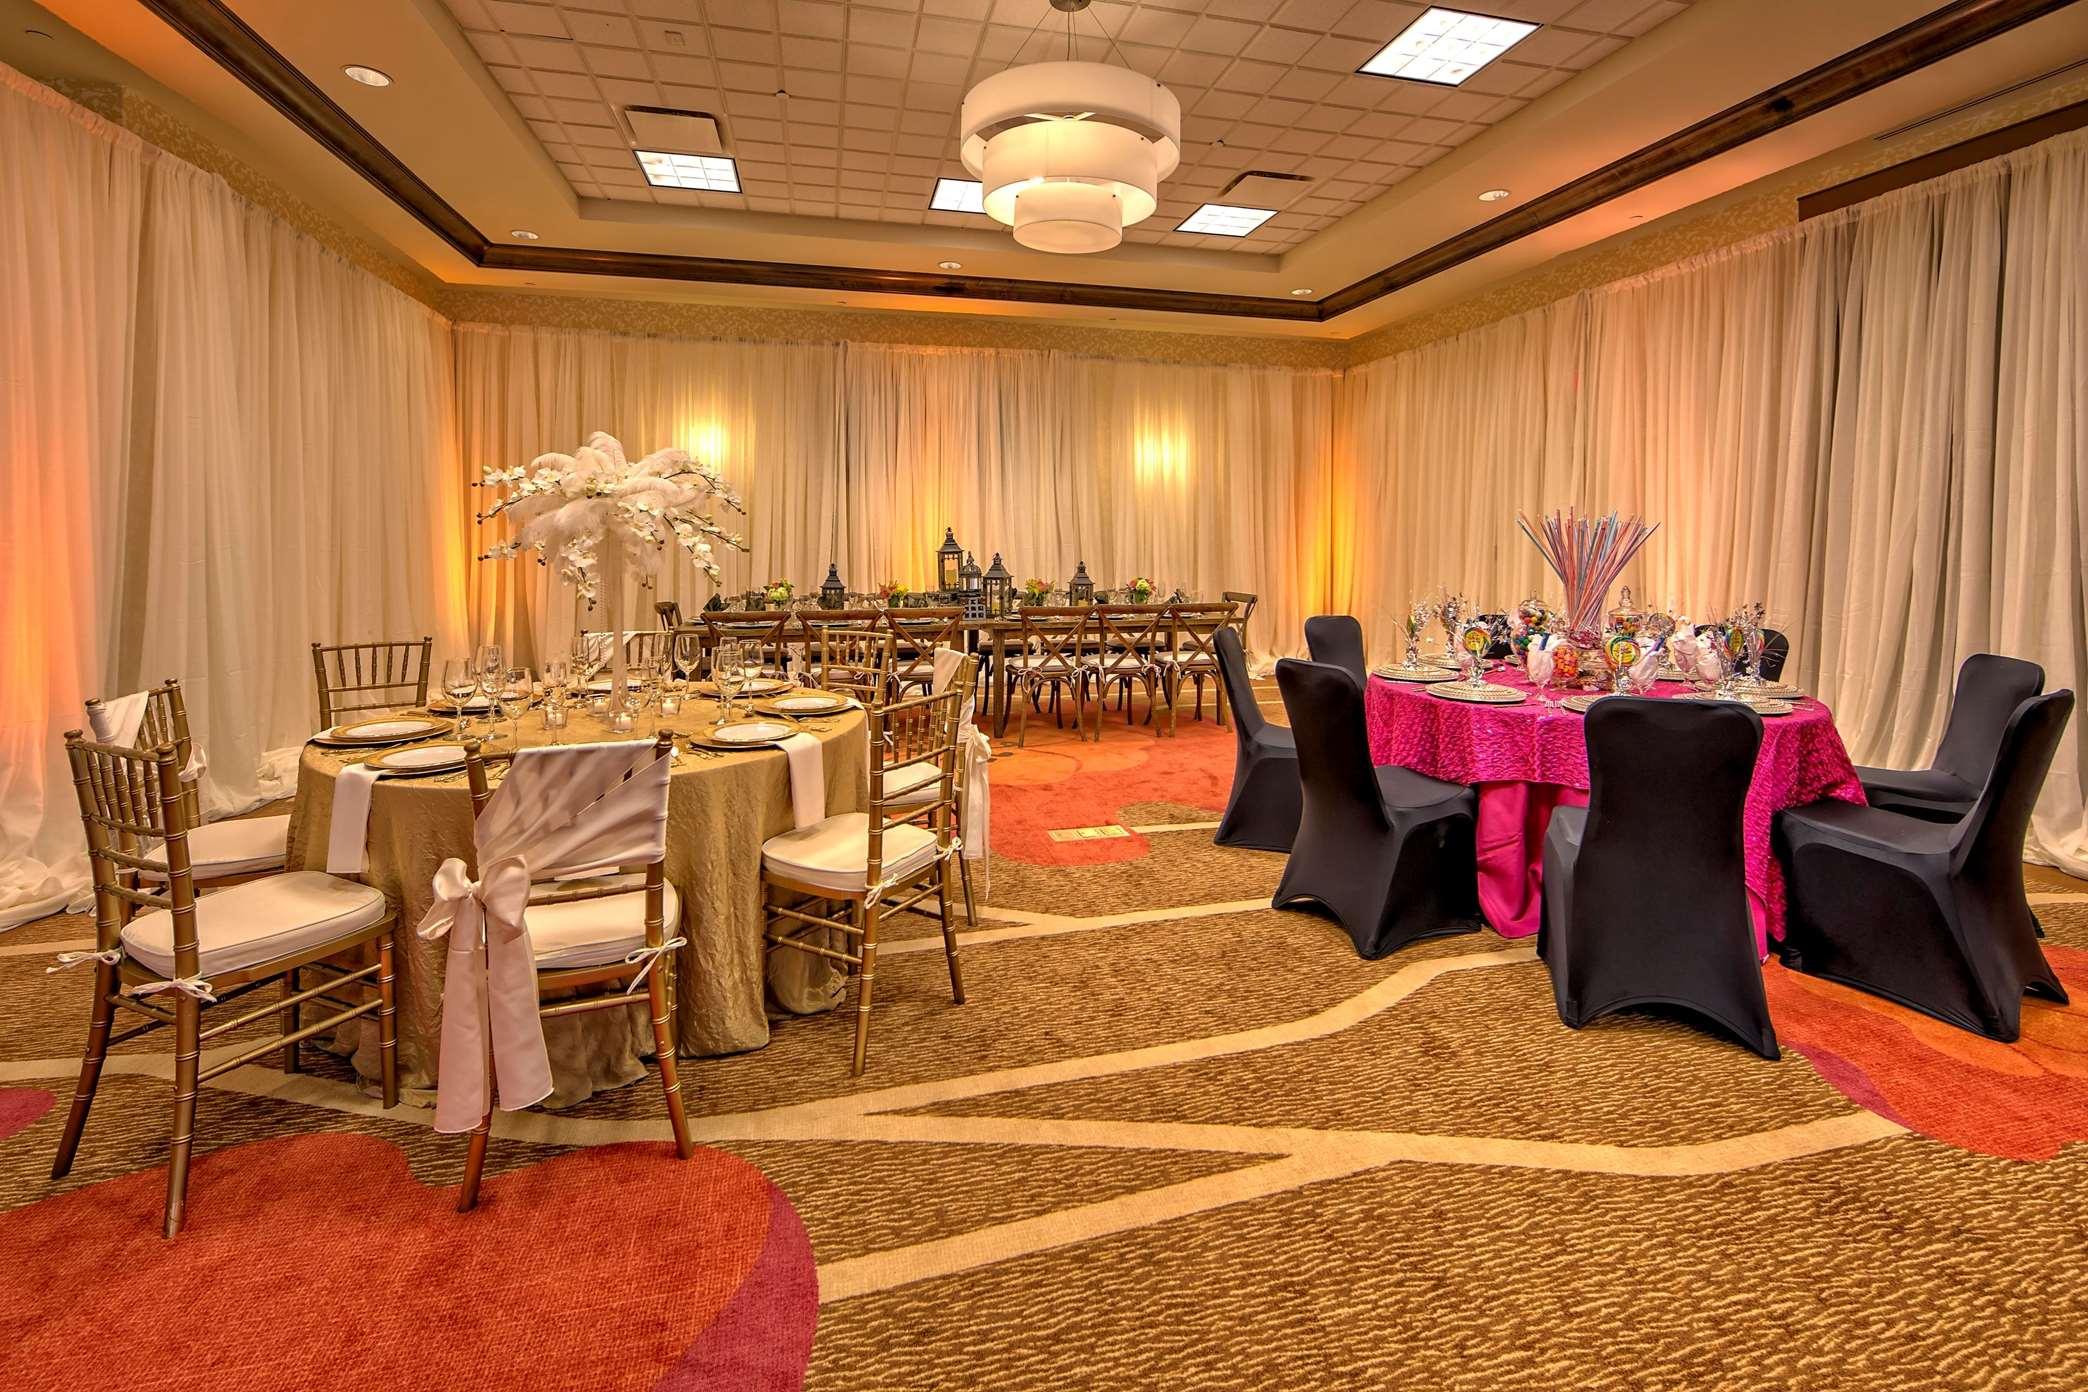 Hilton Garden Inn Memphis/Wolfchase Galleria 7955 Ikea Way Cordova ...